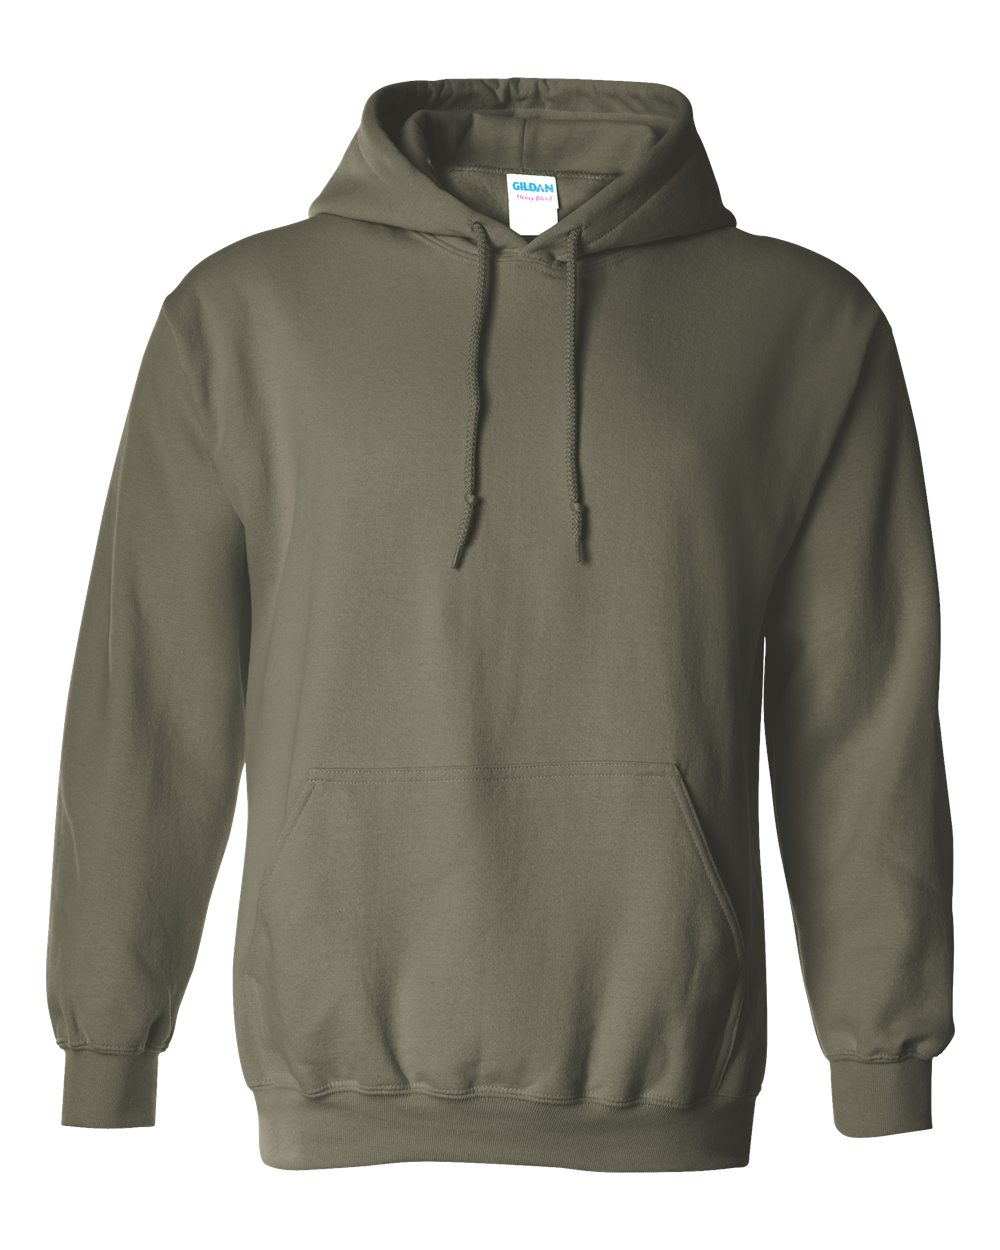 Gildan-Mens-Blank-Hoodie-Heavy-Blend-Hooded-Sweatshirt-Solid-18500-up-to-5XL thumbnail 59